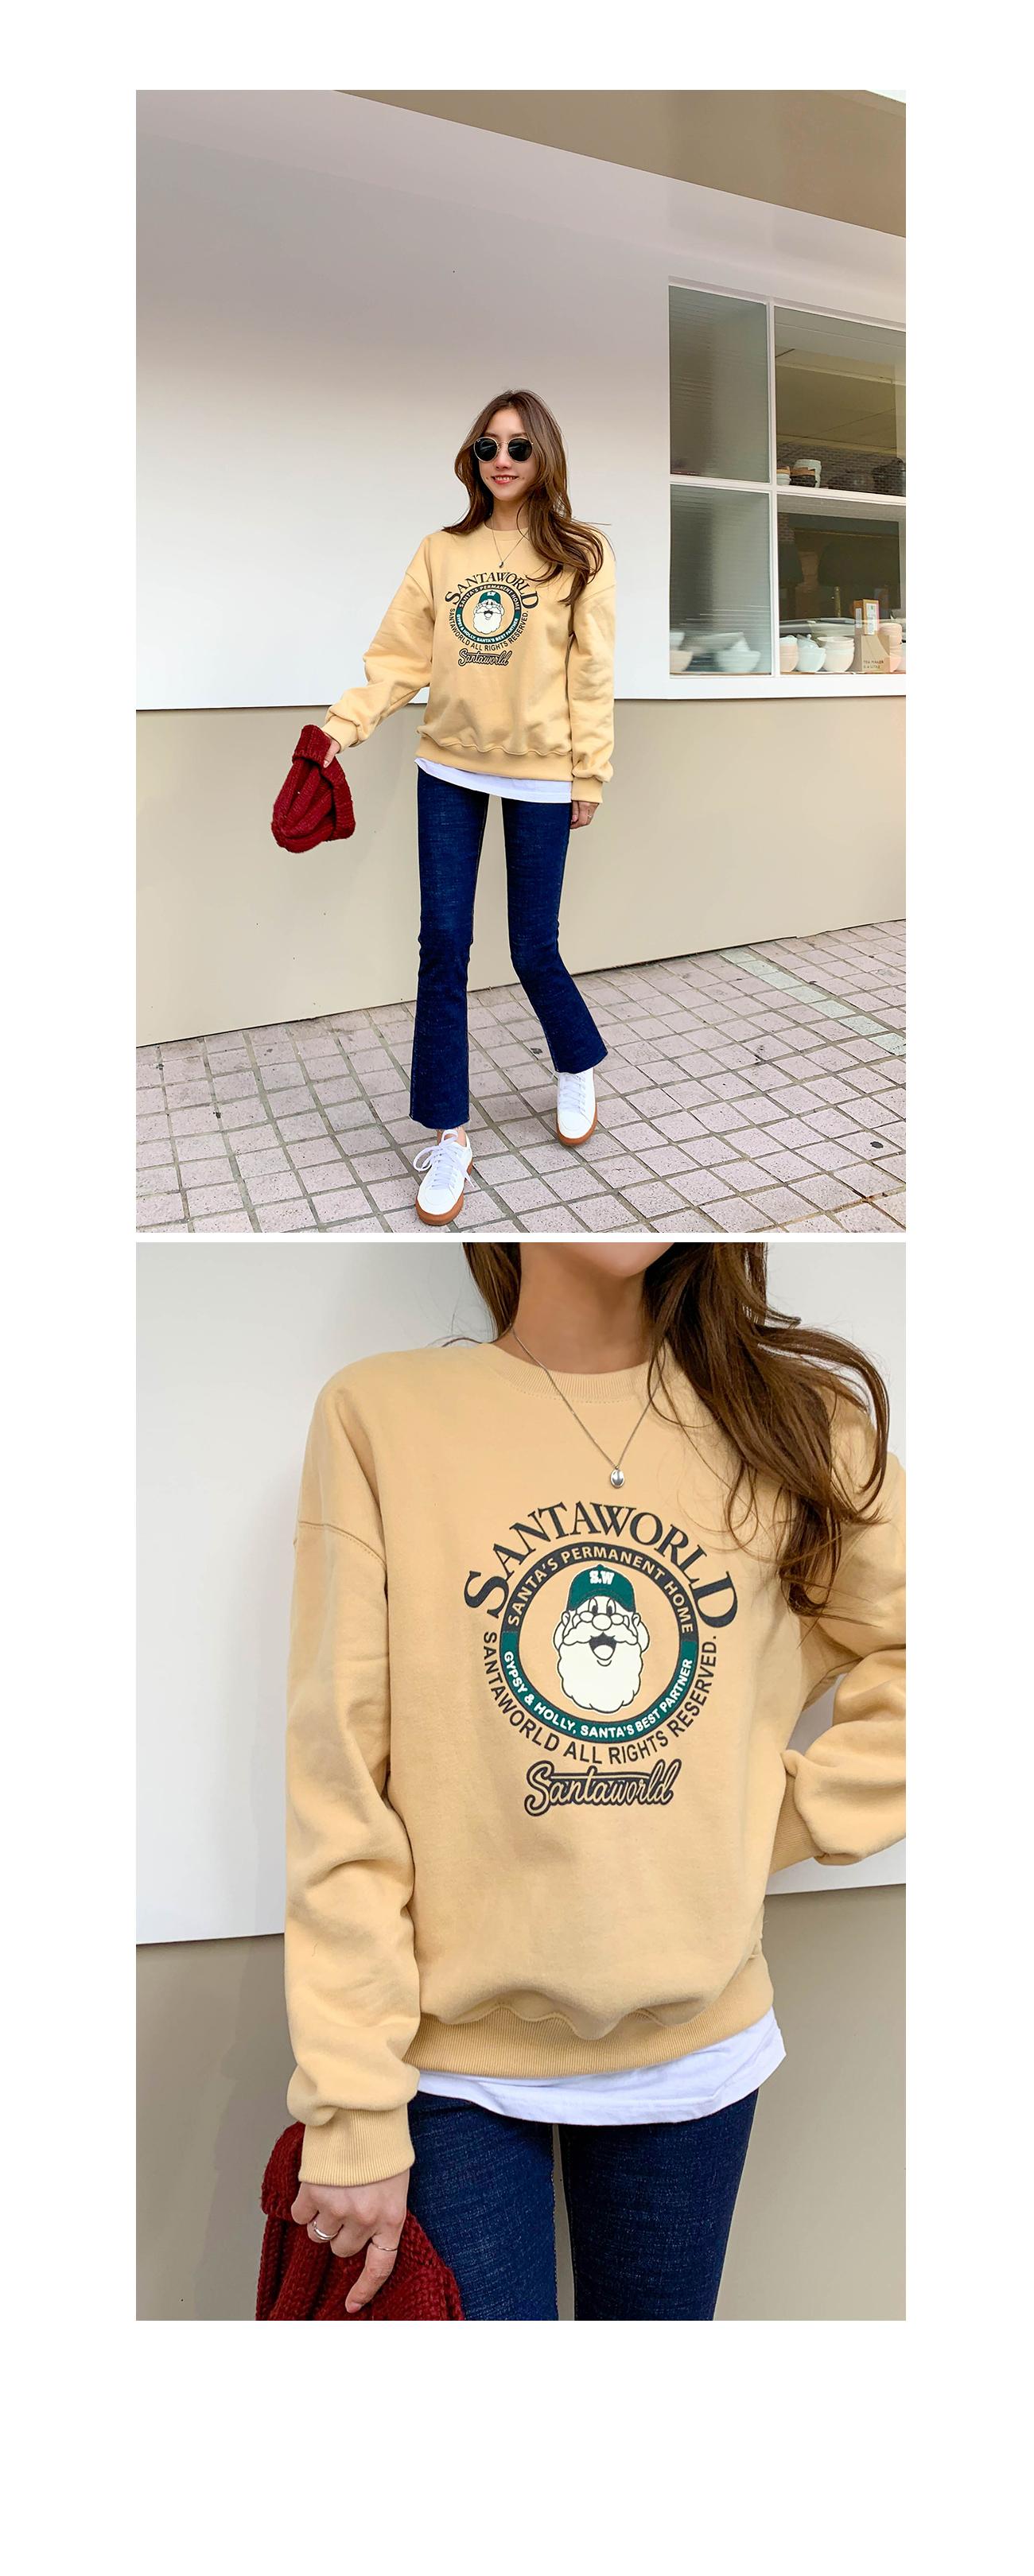 World Santa Woolen of Sweatshirt brushed # 108706